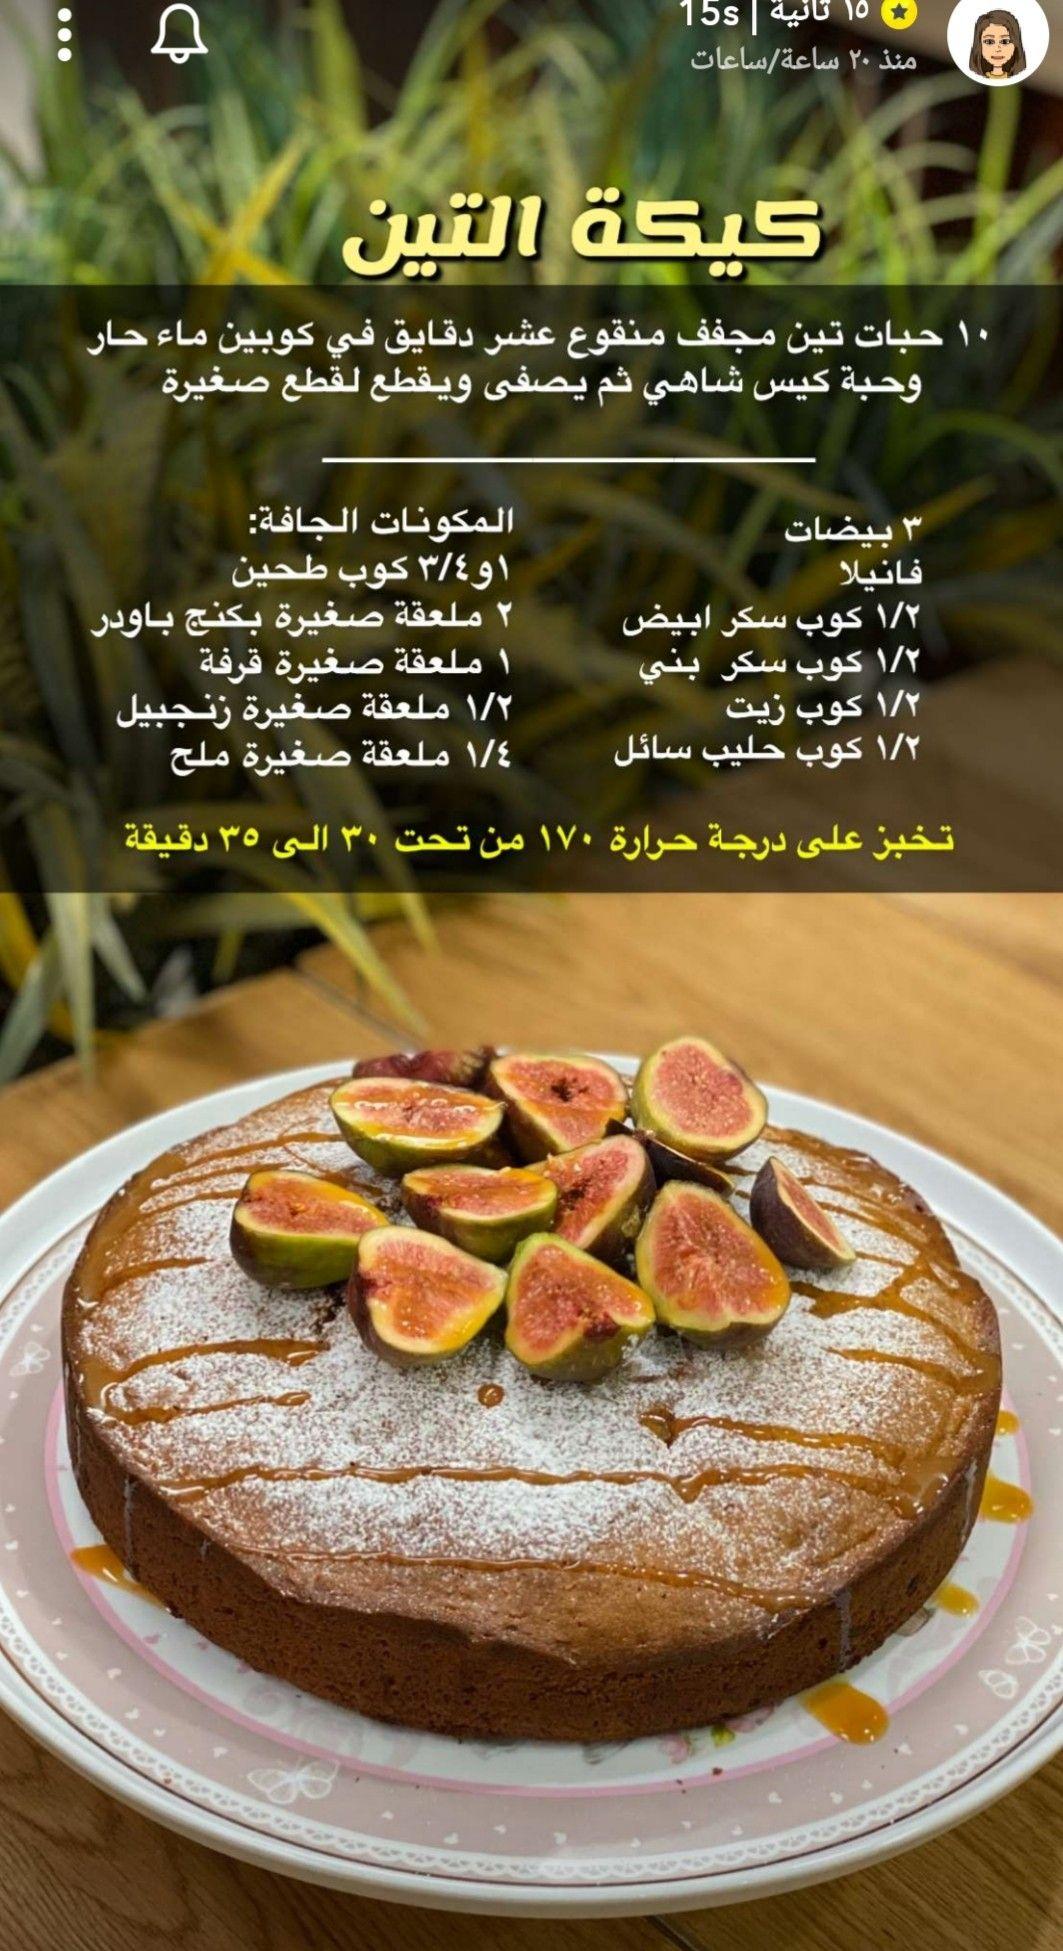 Pin By Bdoor On Food طبخ In 2020 Food Breakfast Beef